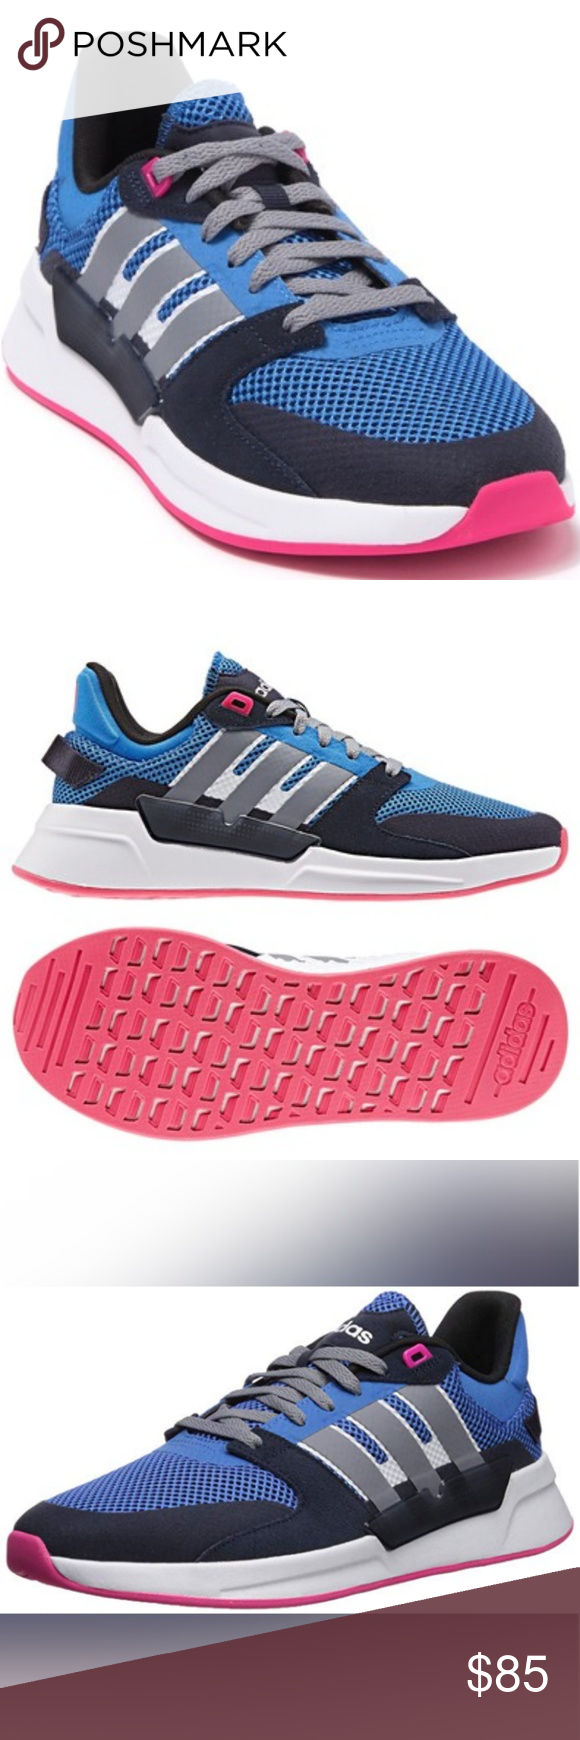 adidas 90s run parley women's sneakers